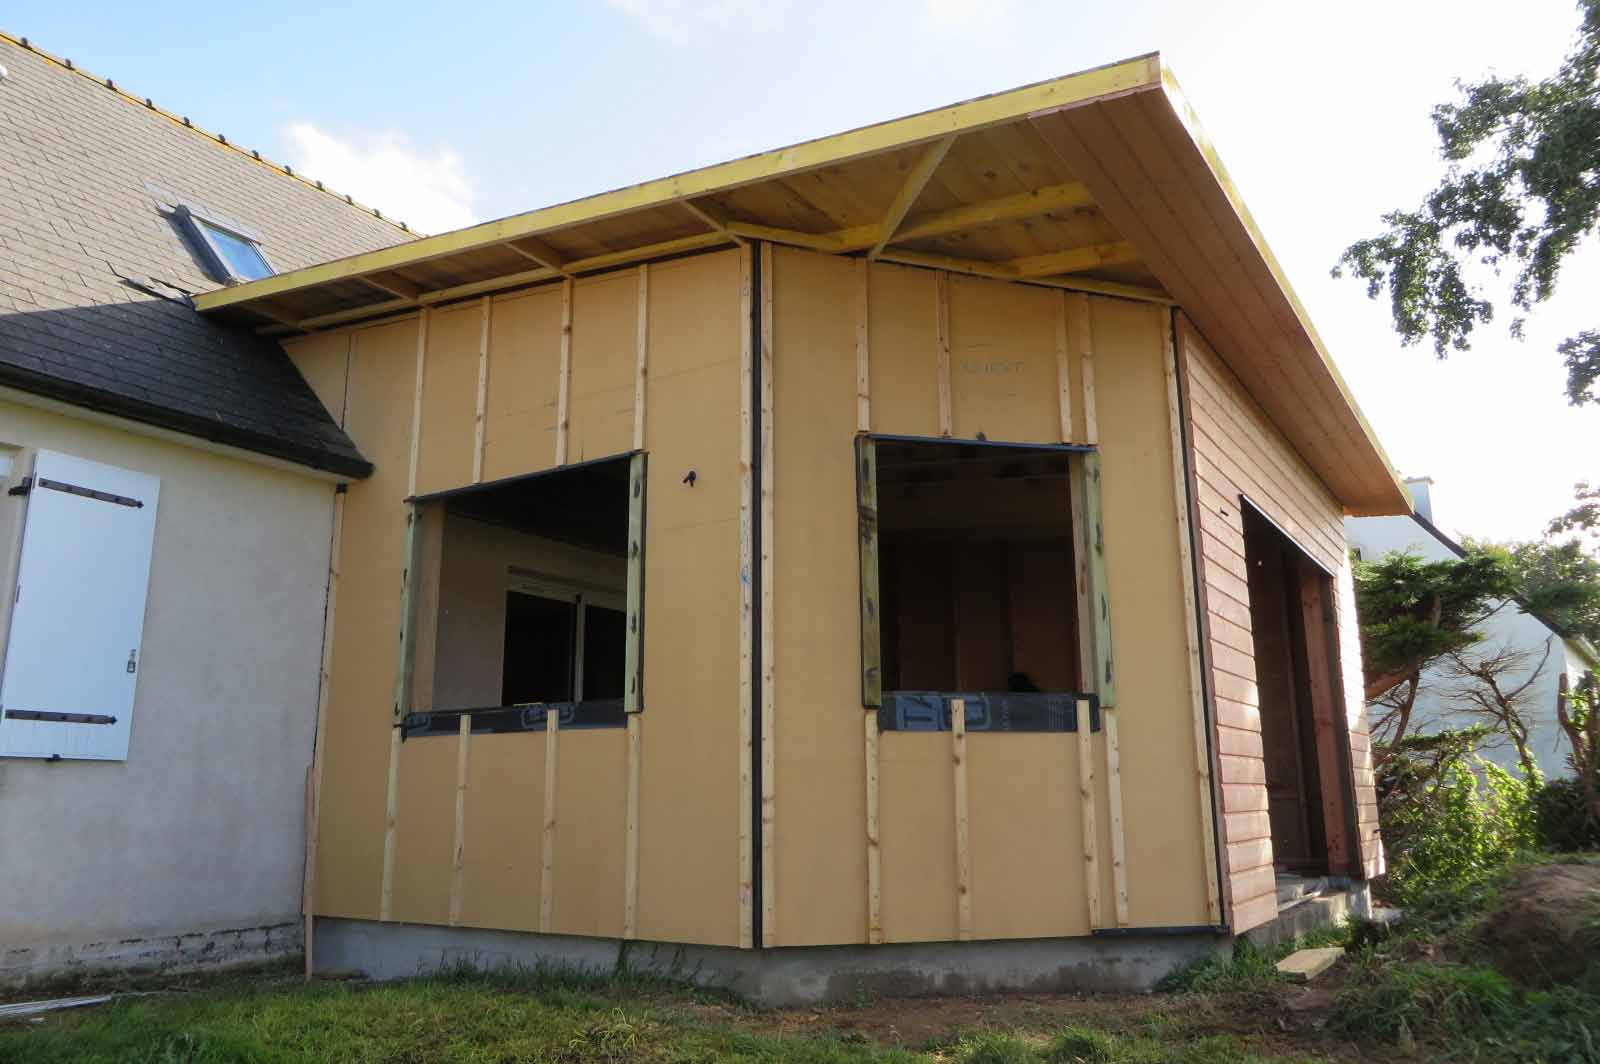 Extension Bois Finistere : Extension bois Finistere Landeda – Maisons bois Acacia